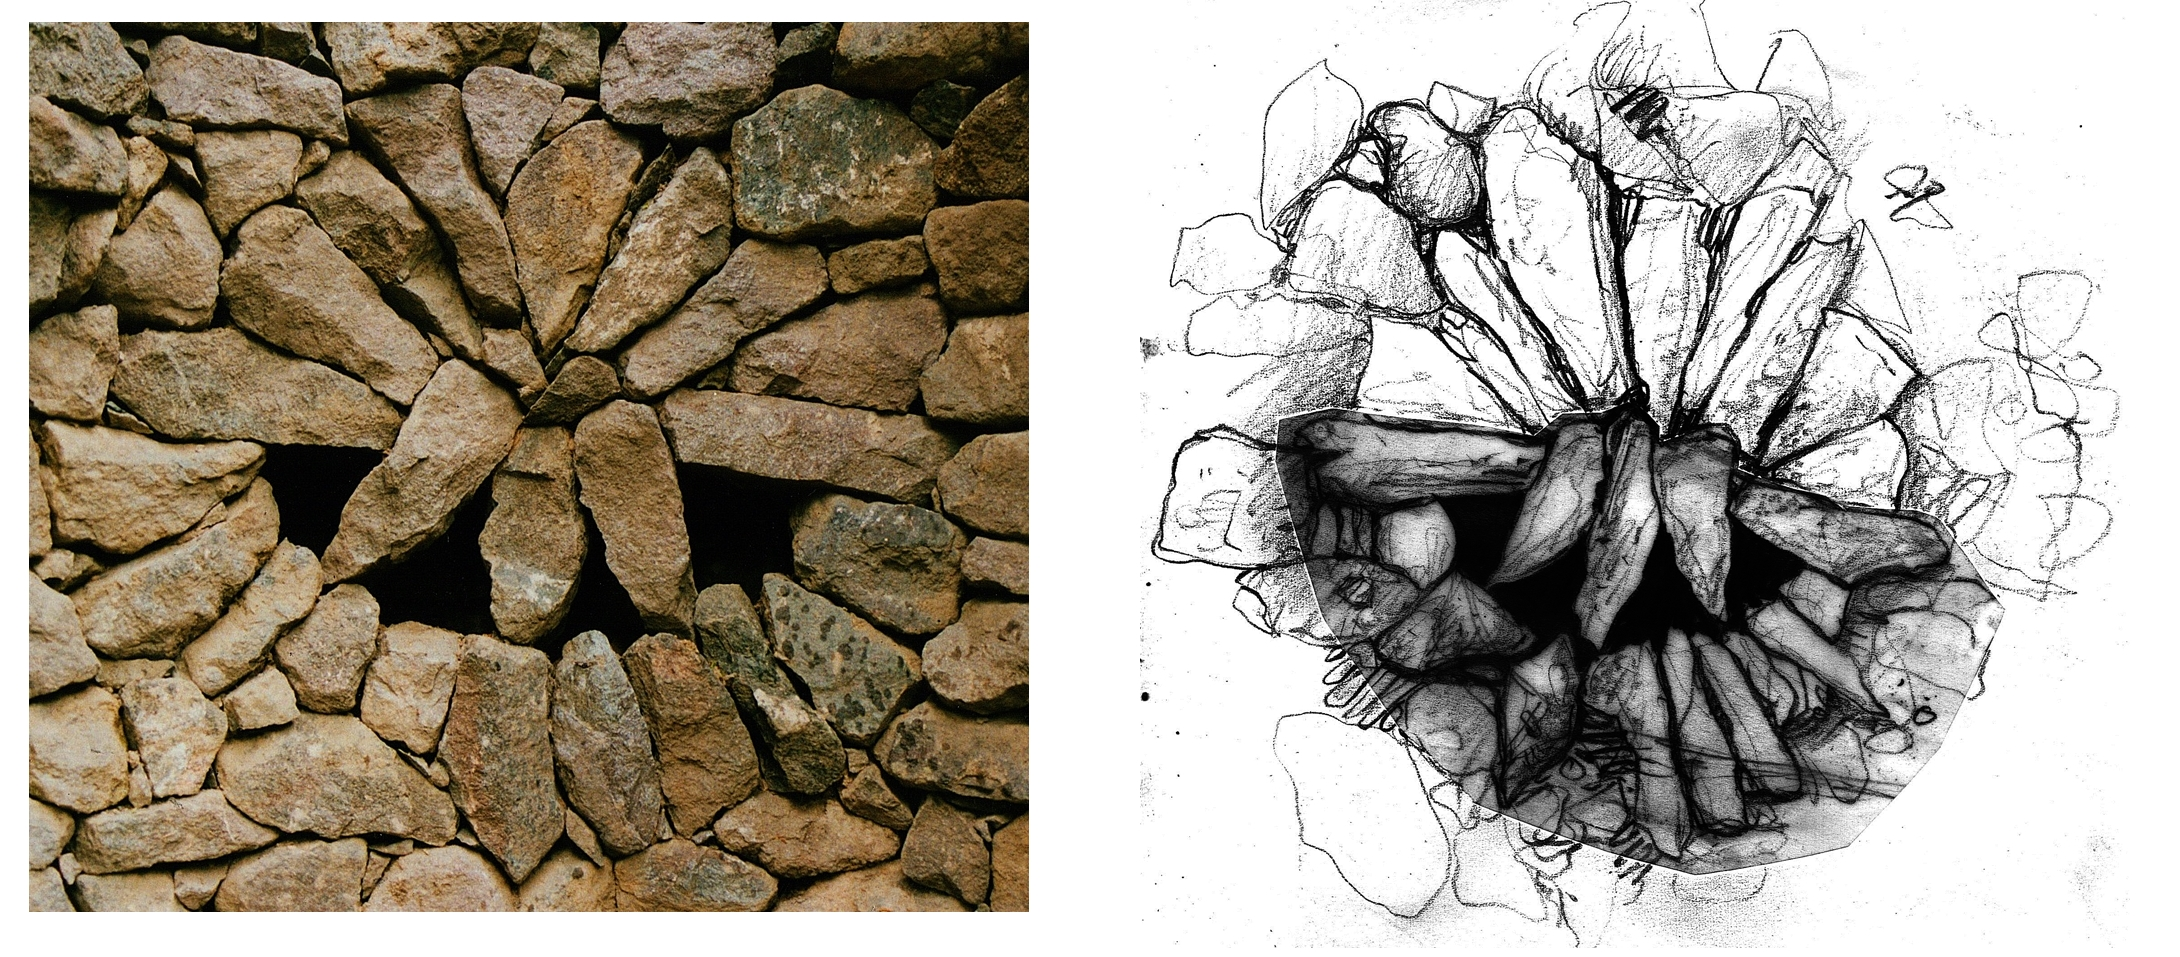 Rouken Glen Alcove & sketch